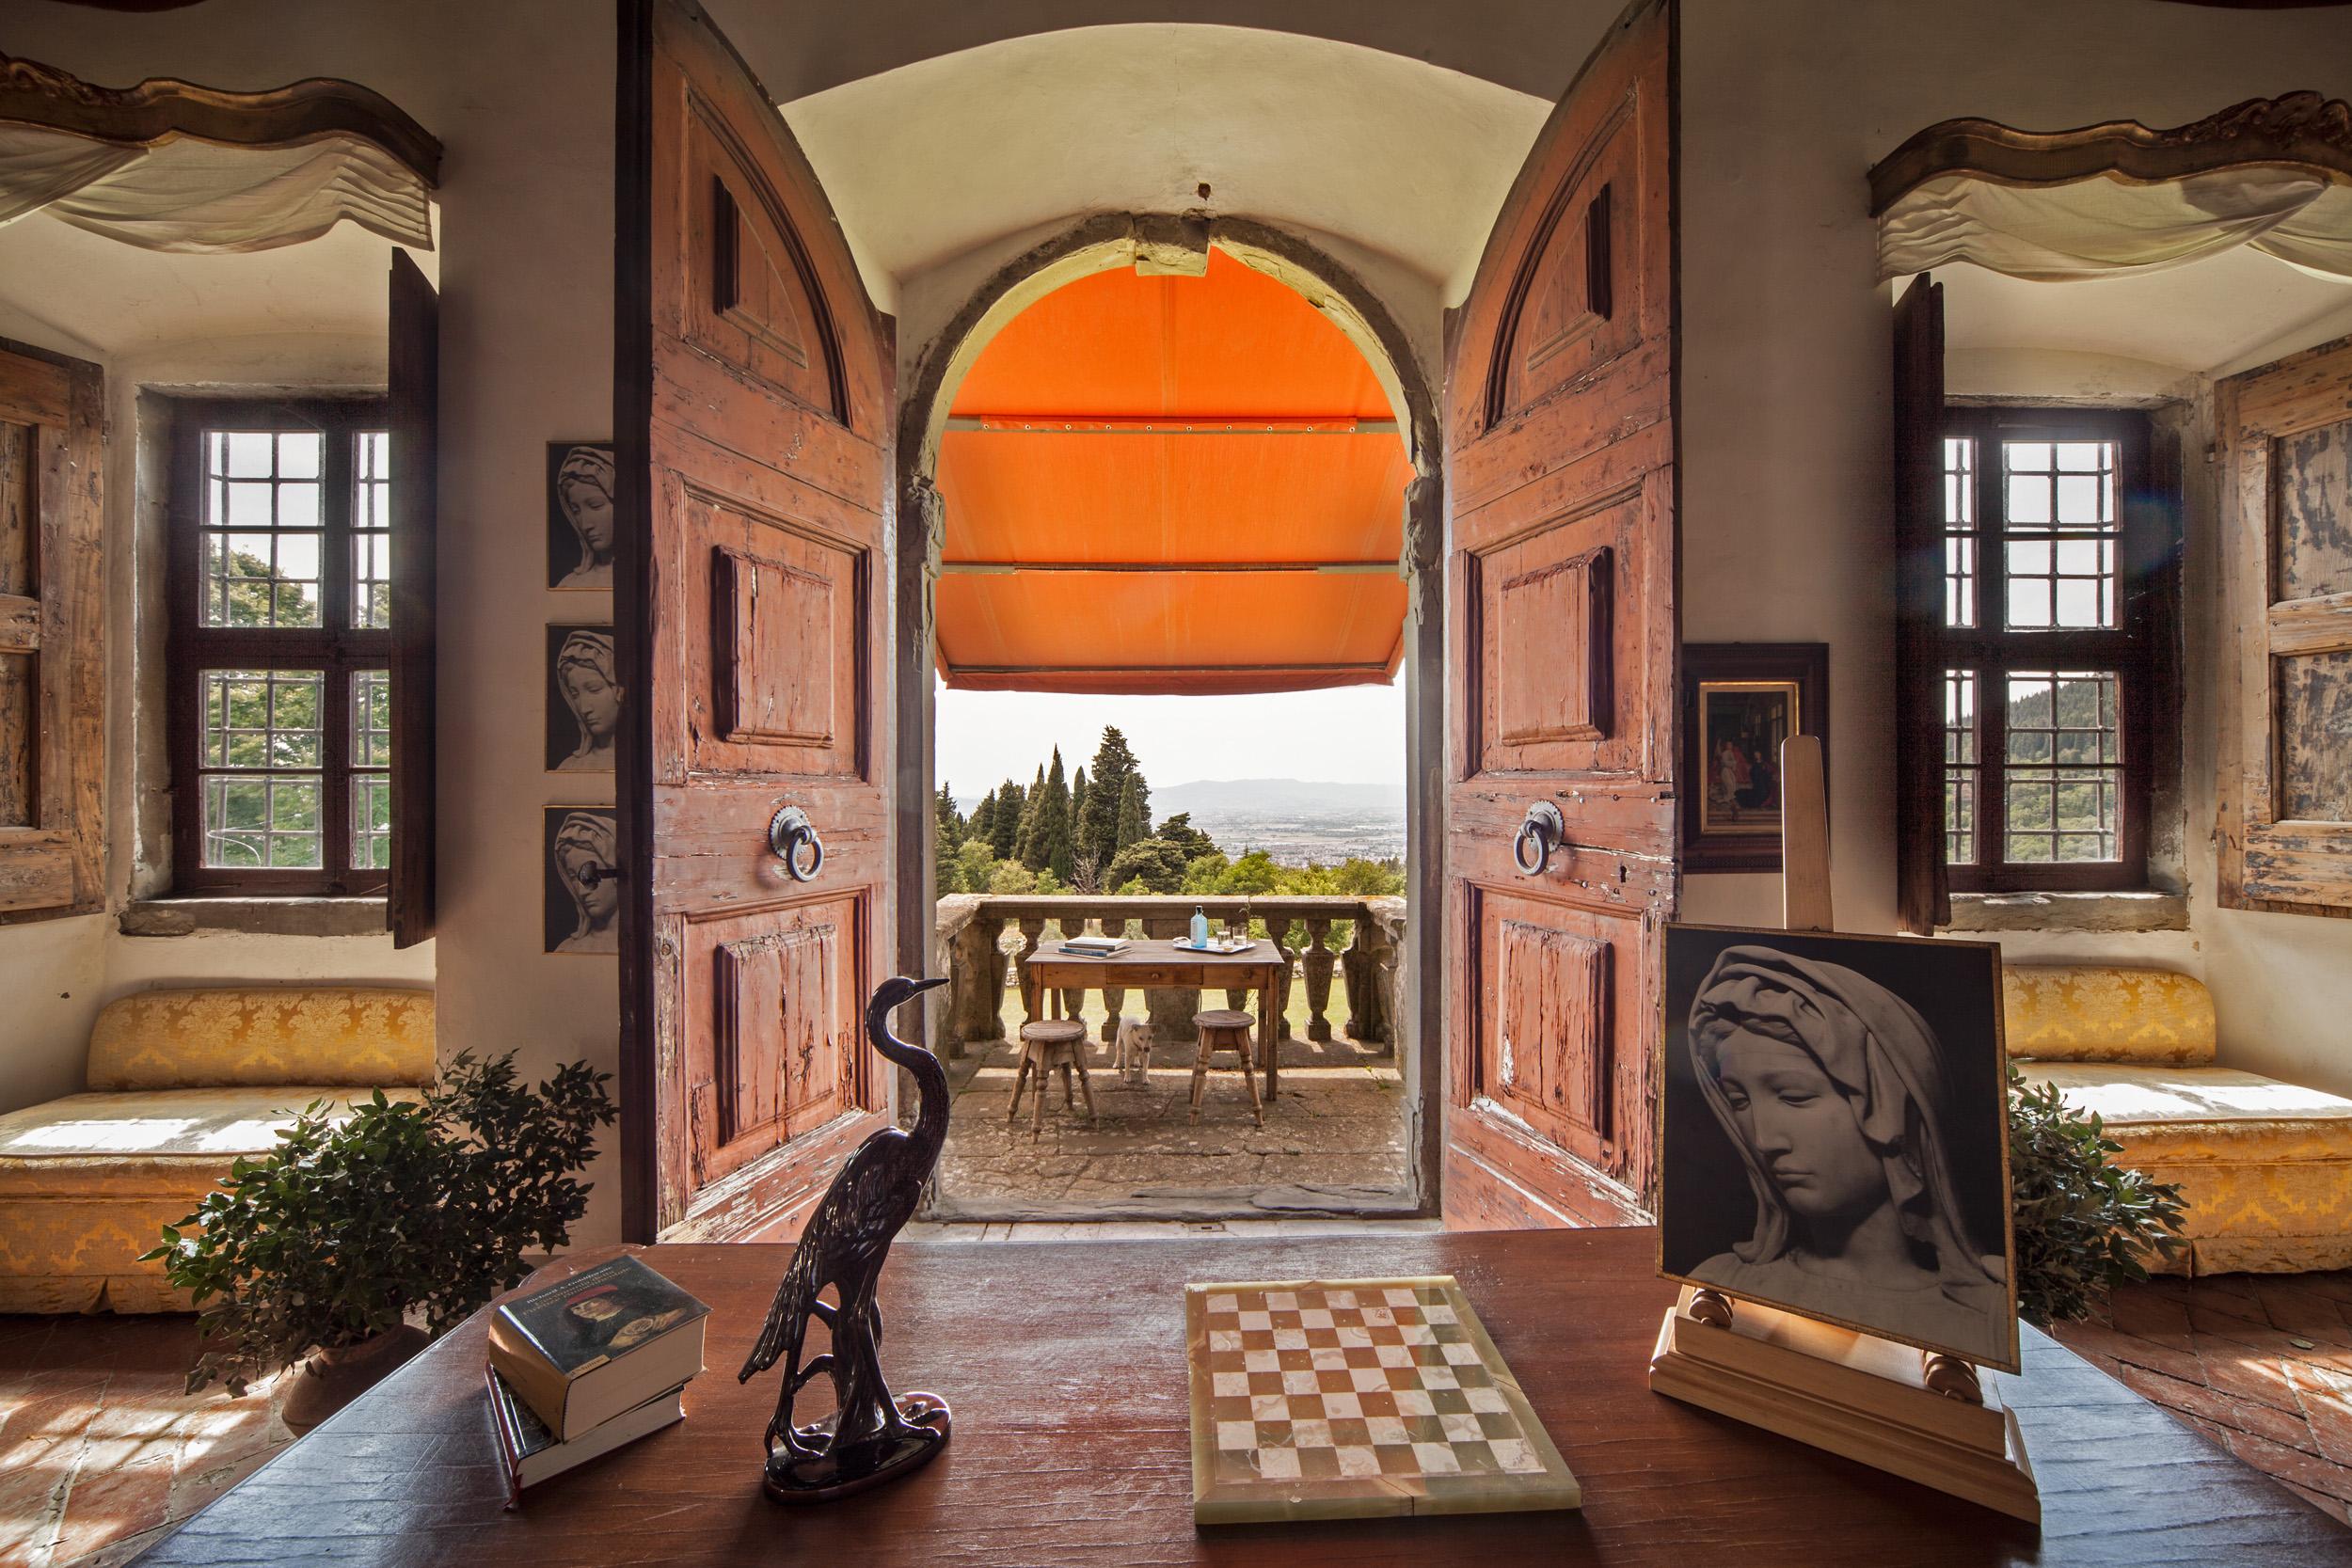 convent_villa_florence_28.jpg